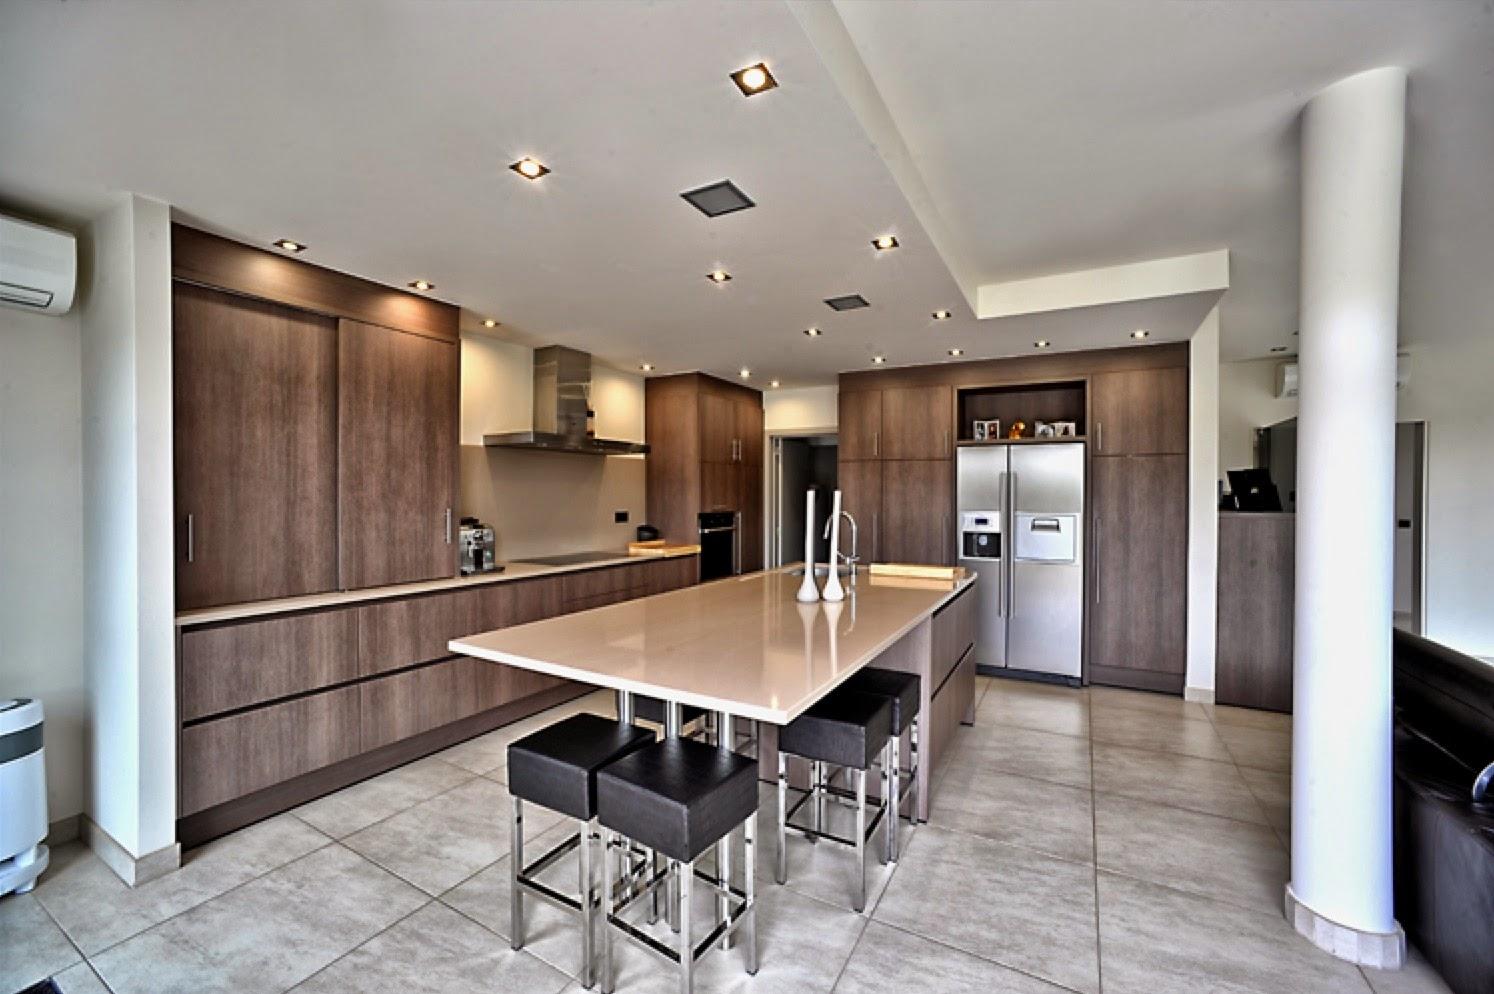 Realisatie interieur moderne keukens interieurbouw for Interieur keukens